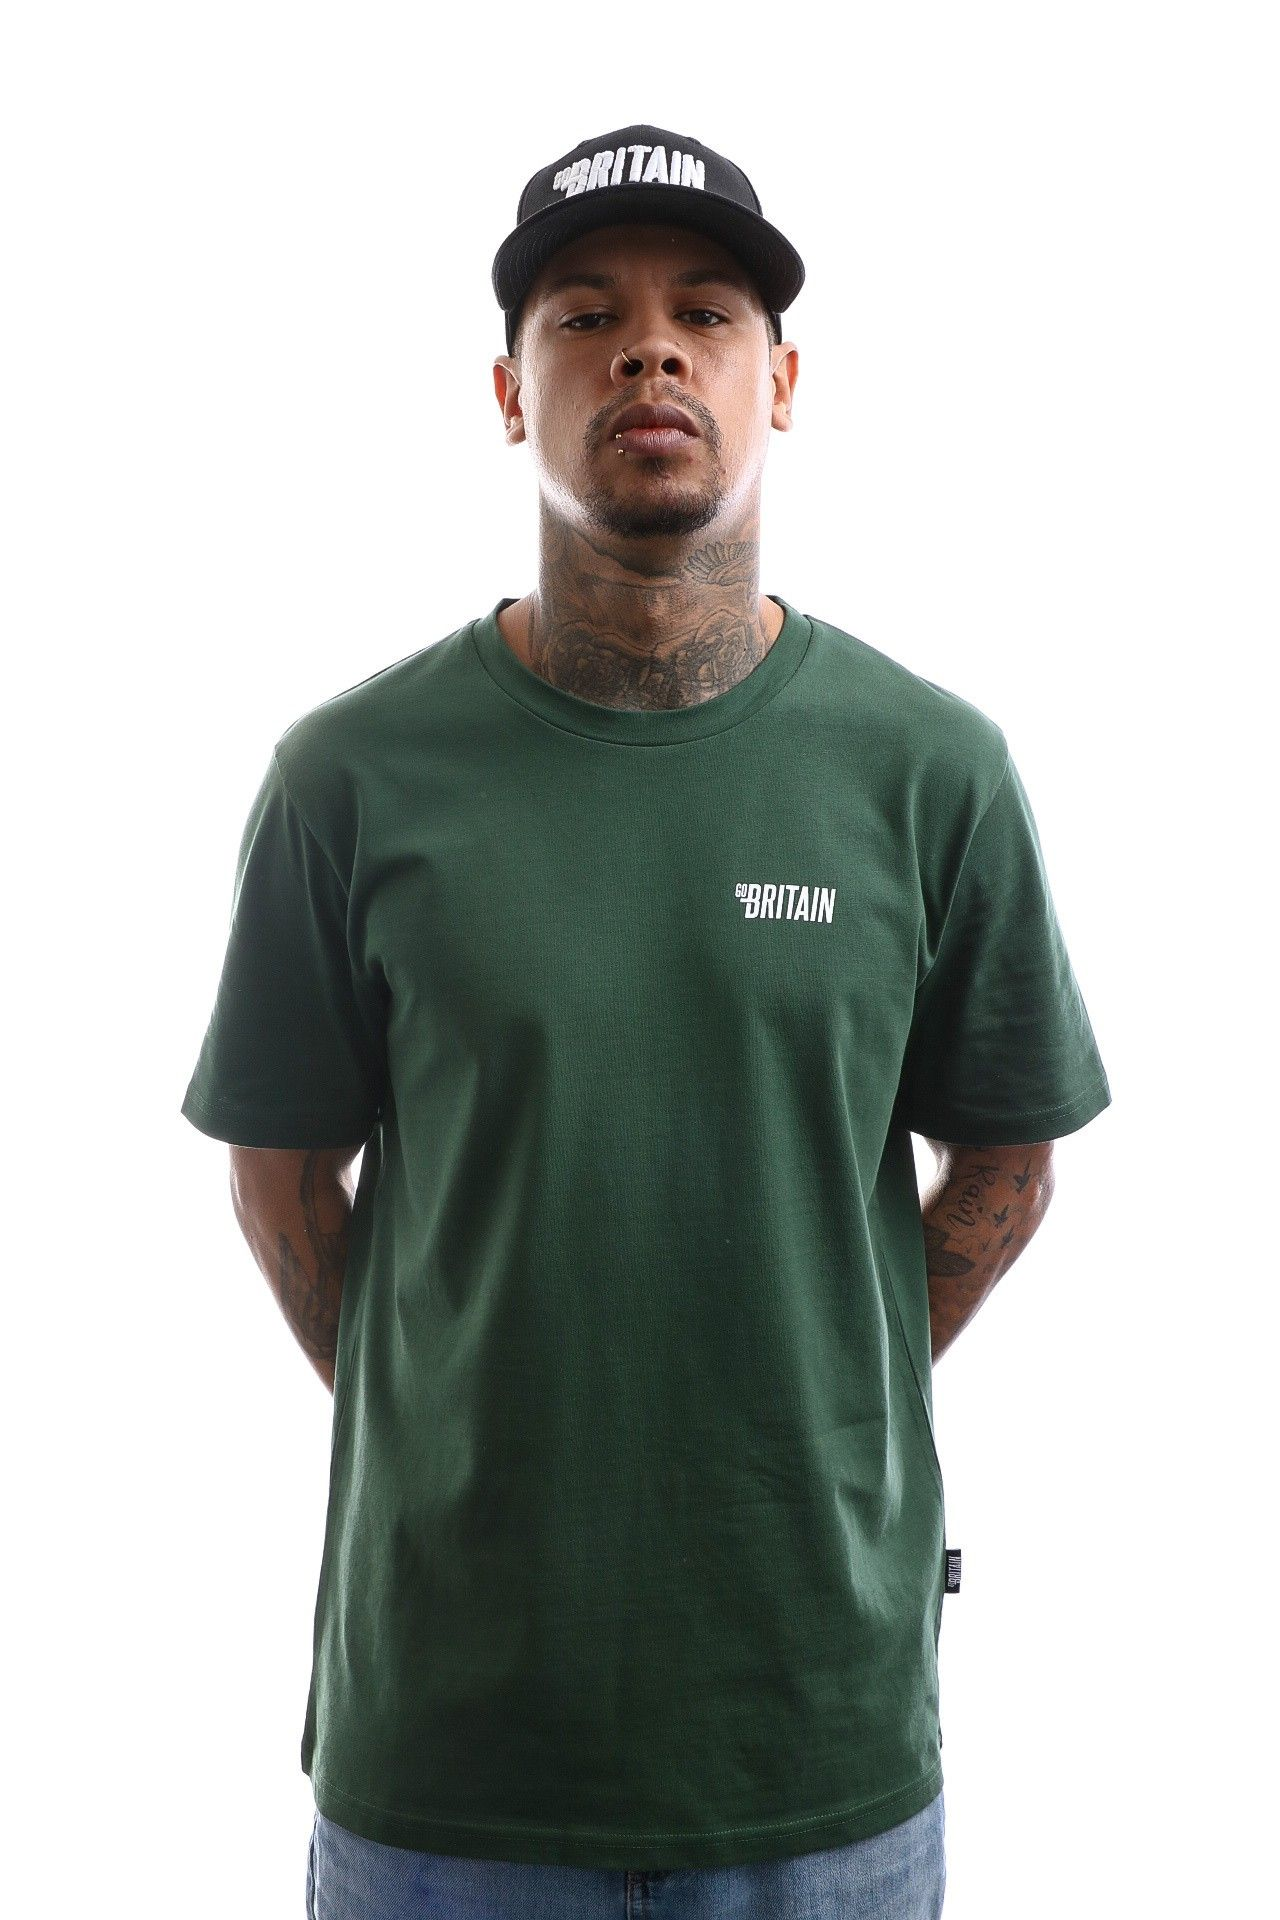 Afbeelding van Go-Britain T-shirt Croydon Tee Green GB.20.Q1.02